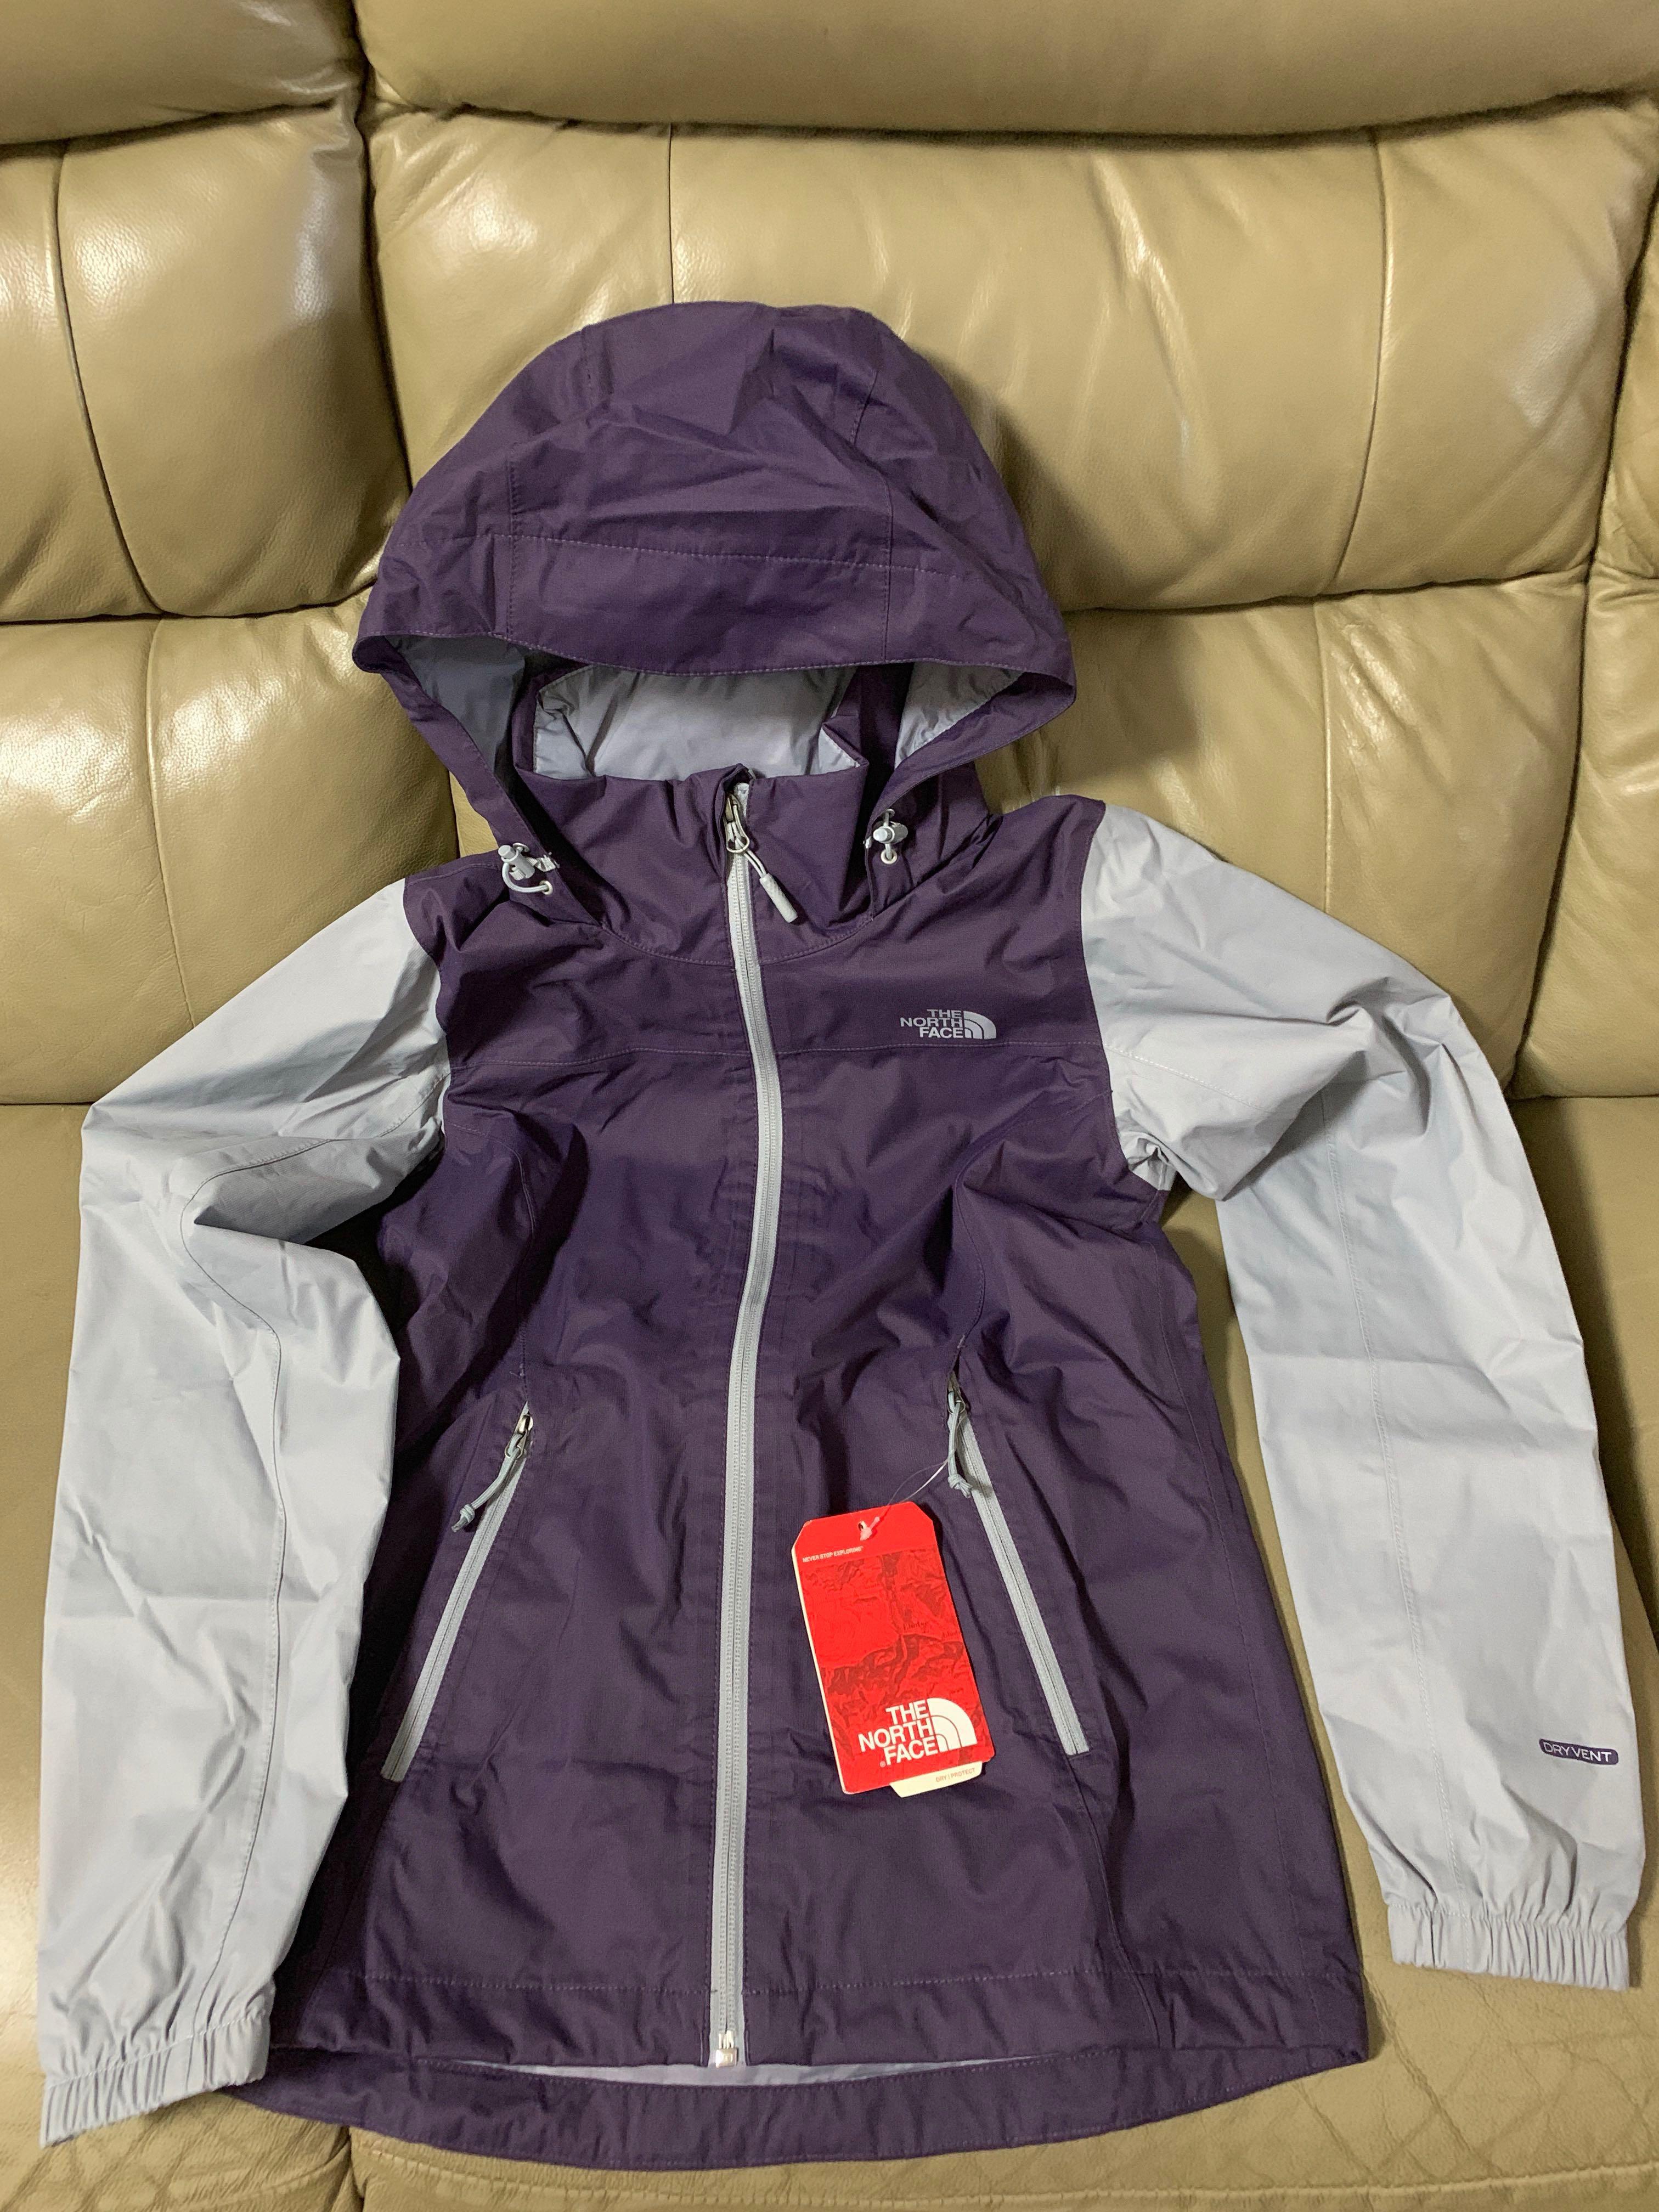 00513f98f The North Face Jacket Rare